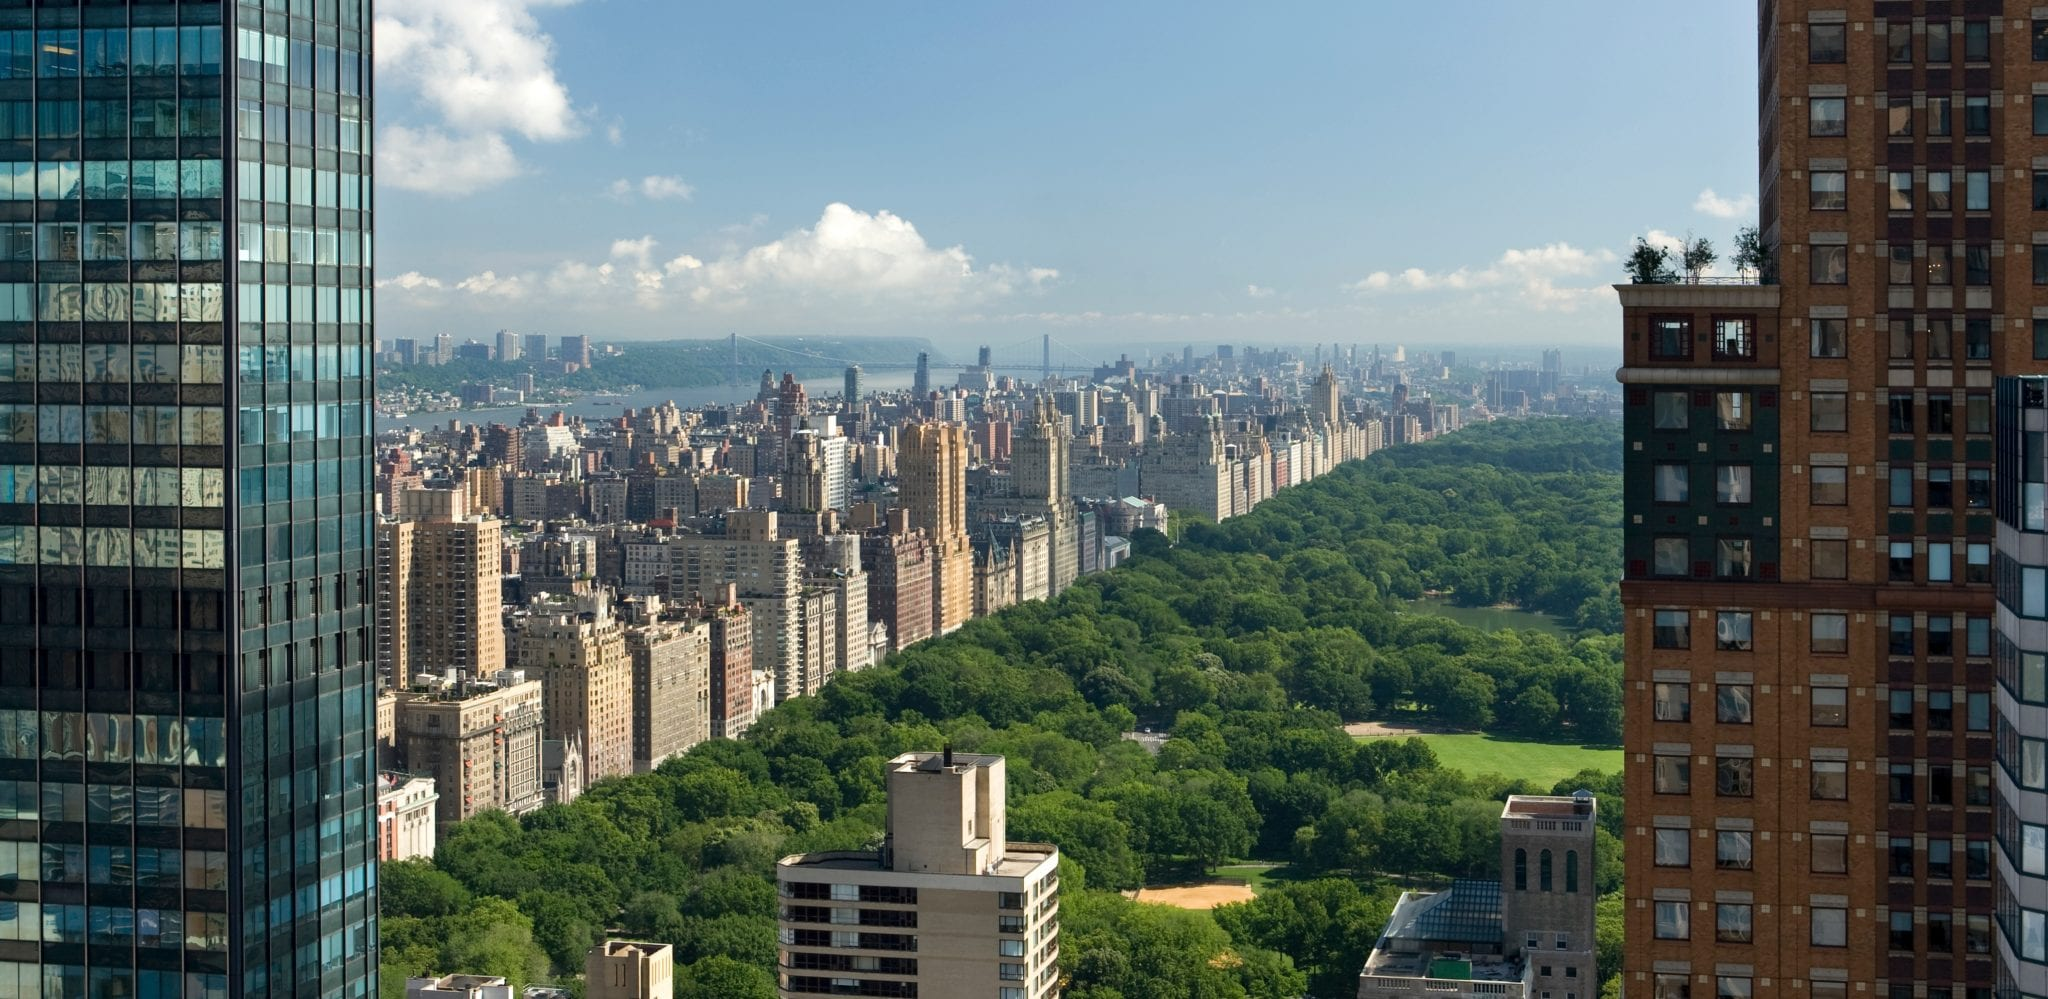 Explore Hidden Gems in Midtown Manhattan